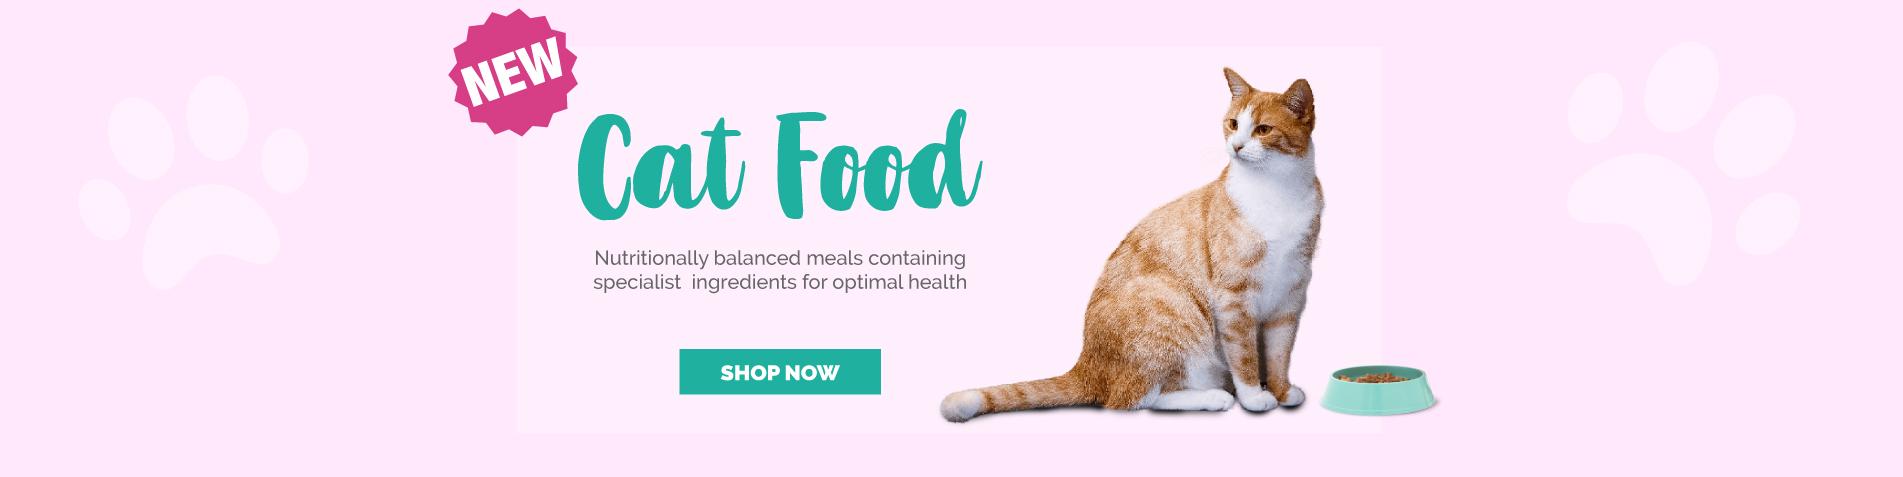 New VitaPaws Cat Food